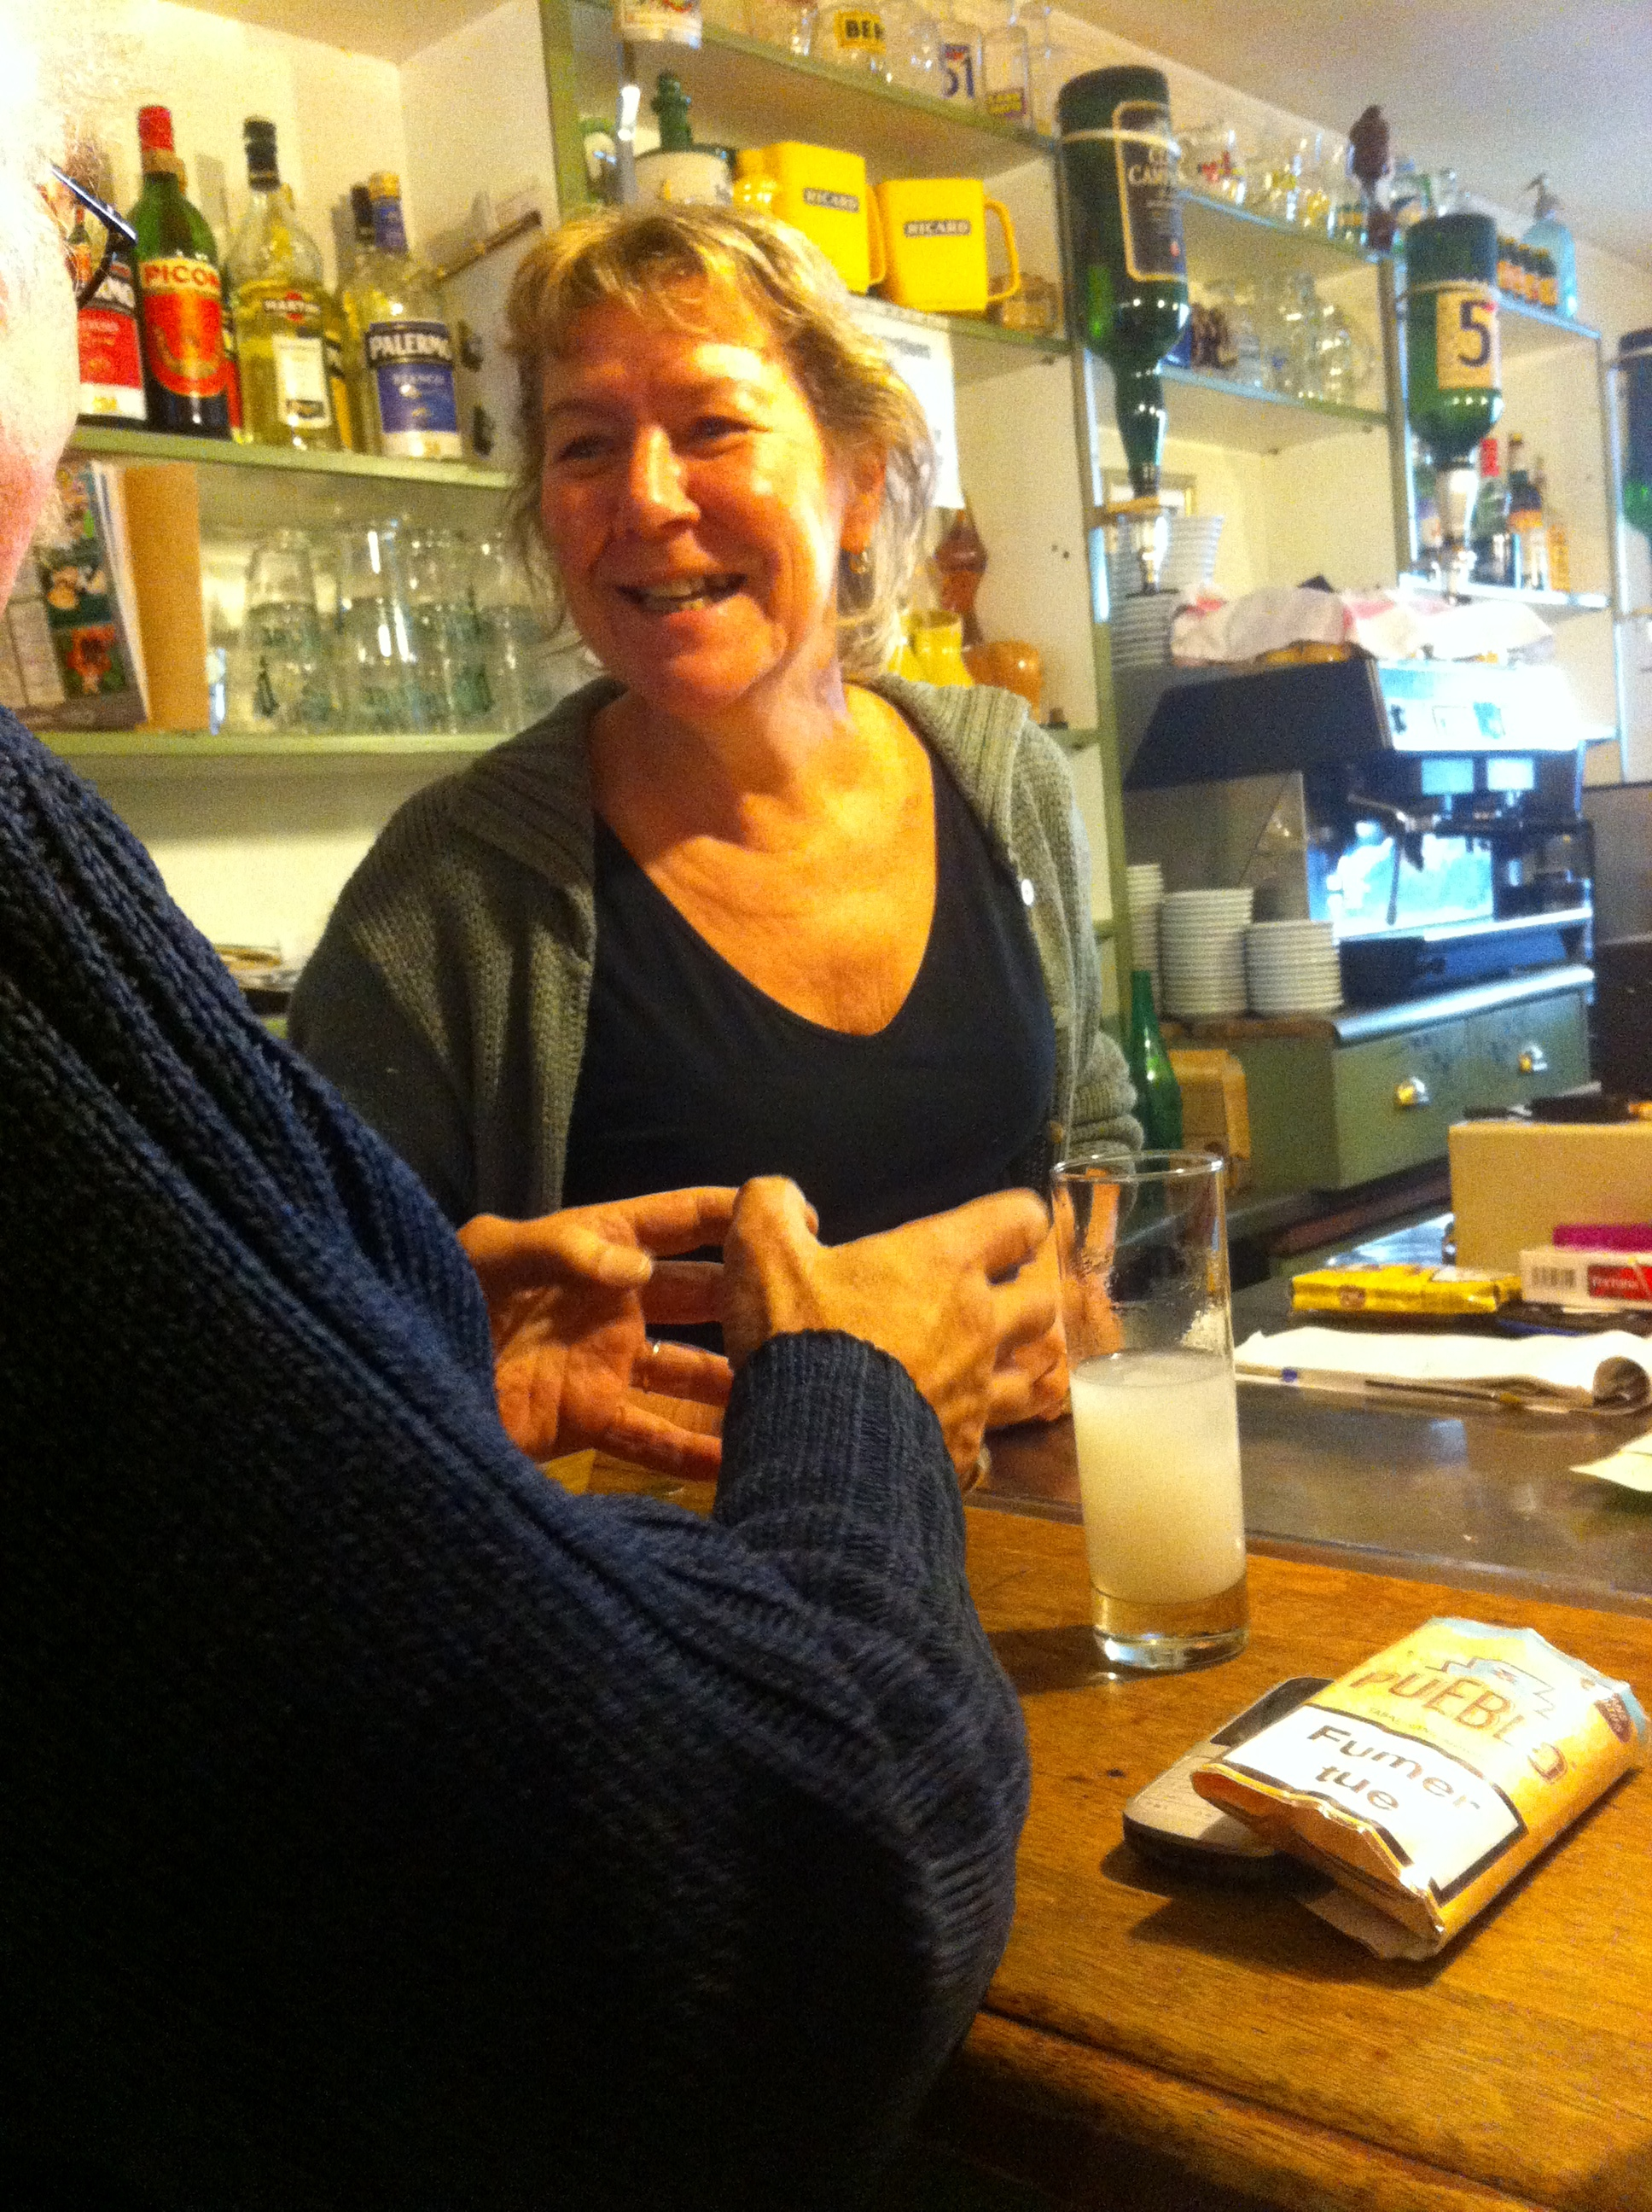 Cafe server, Blauzak